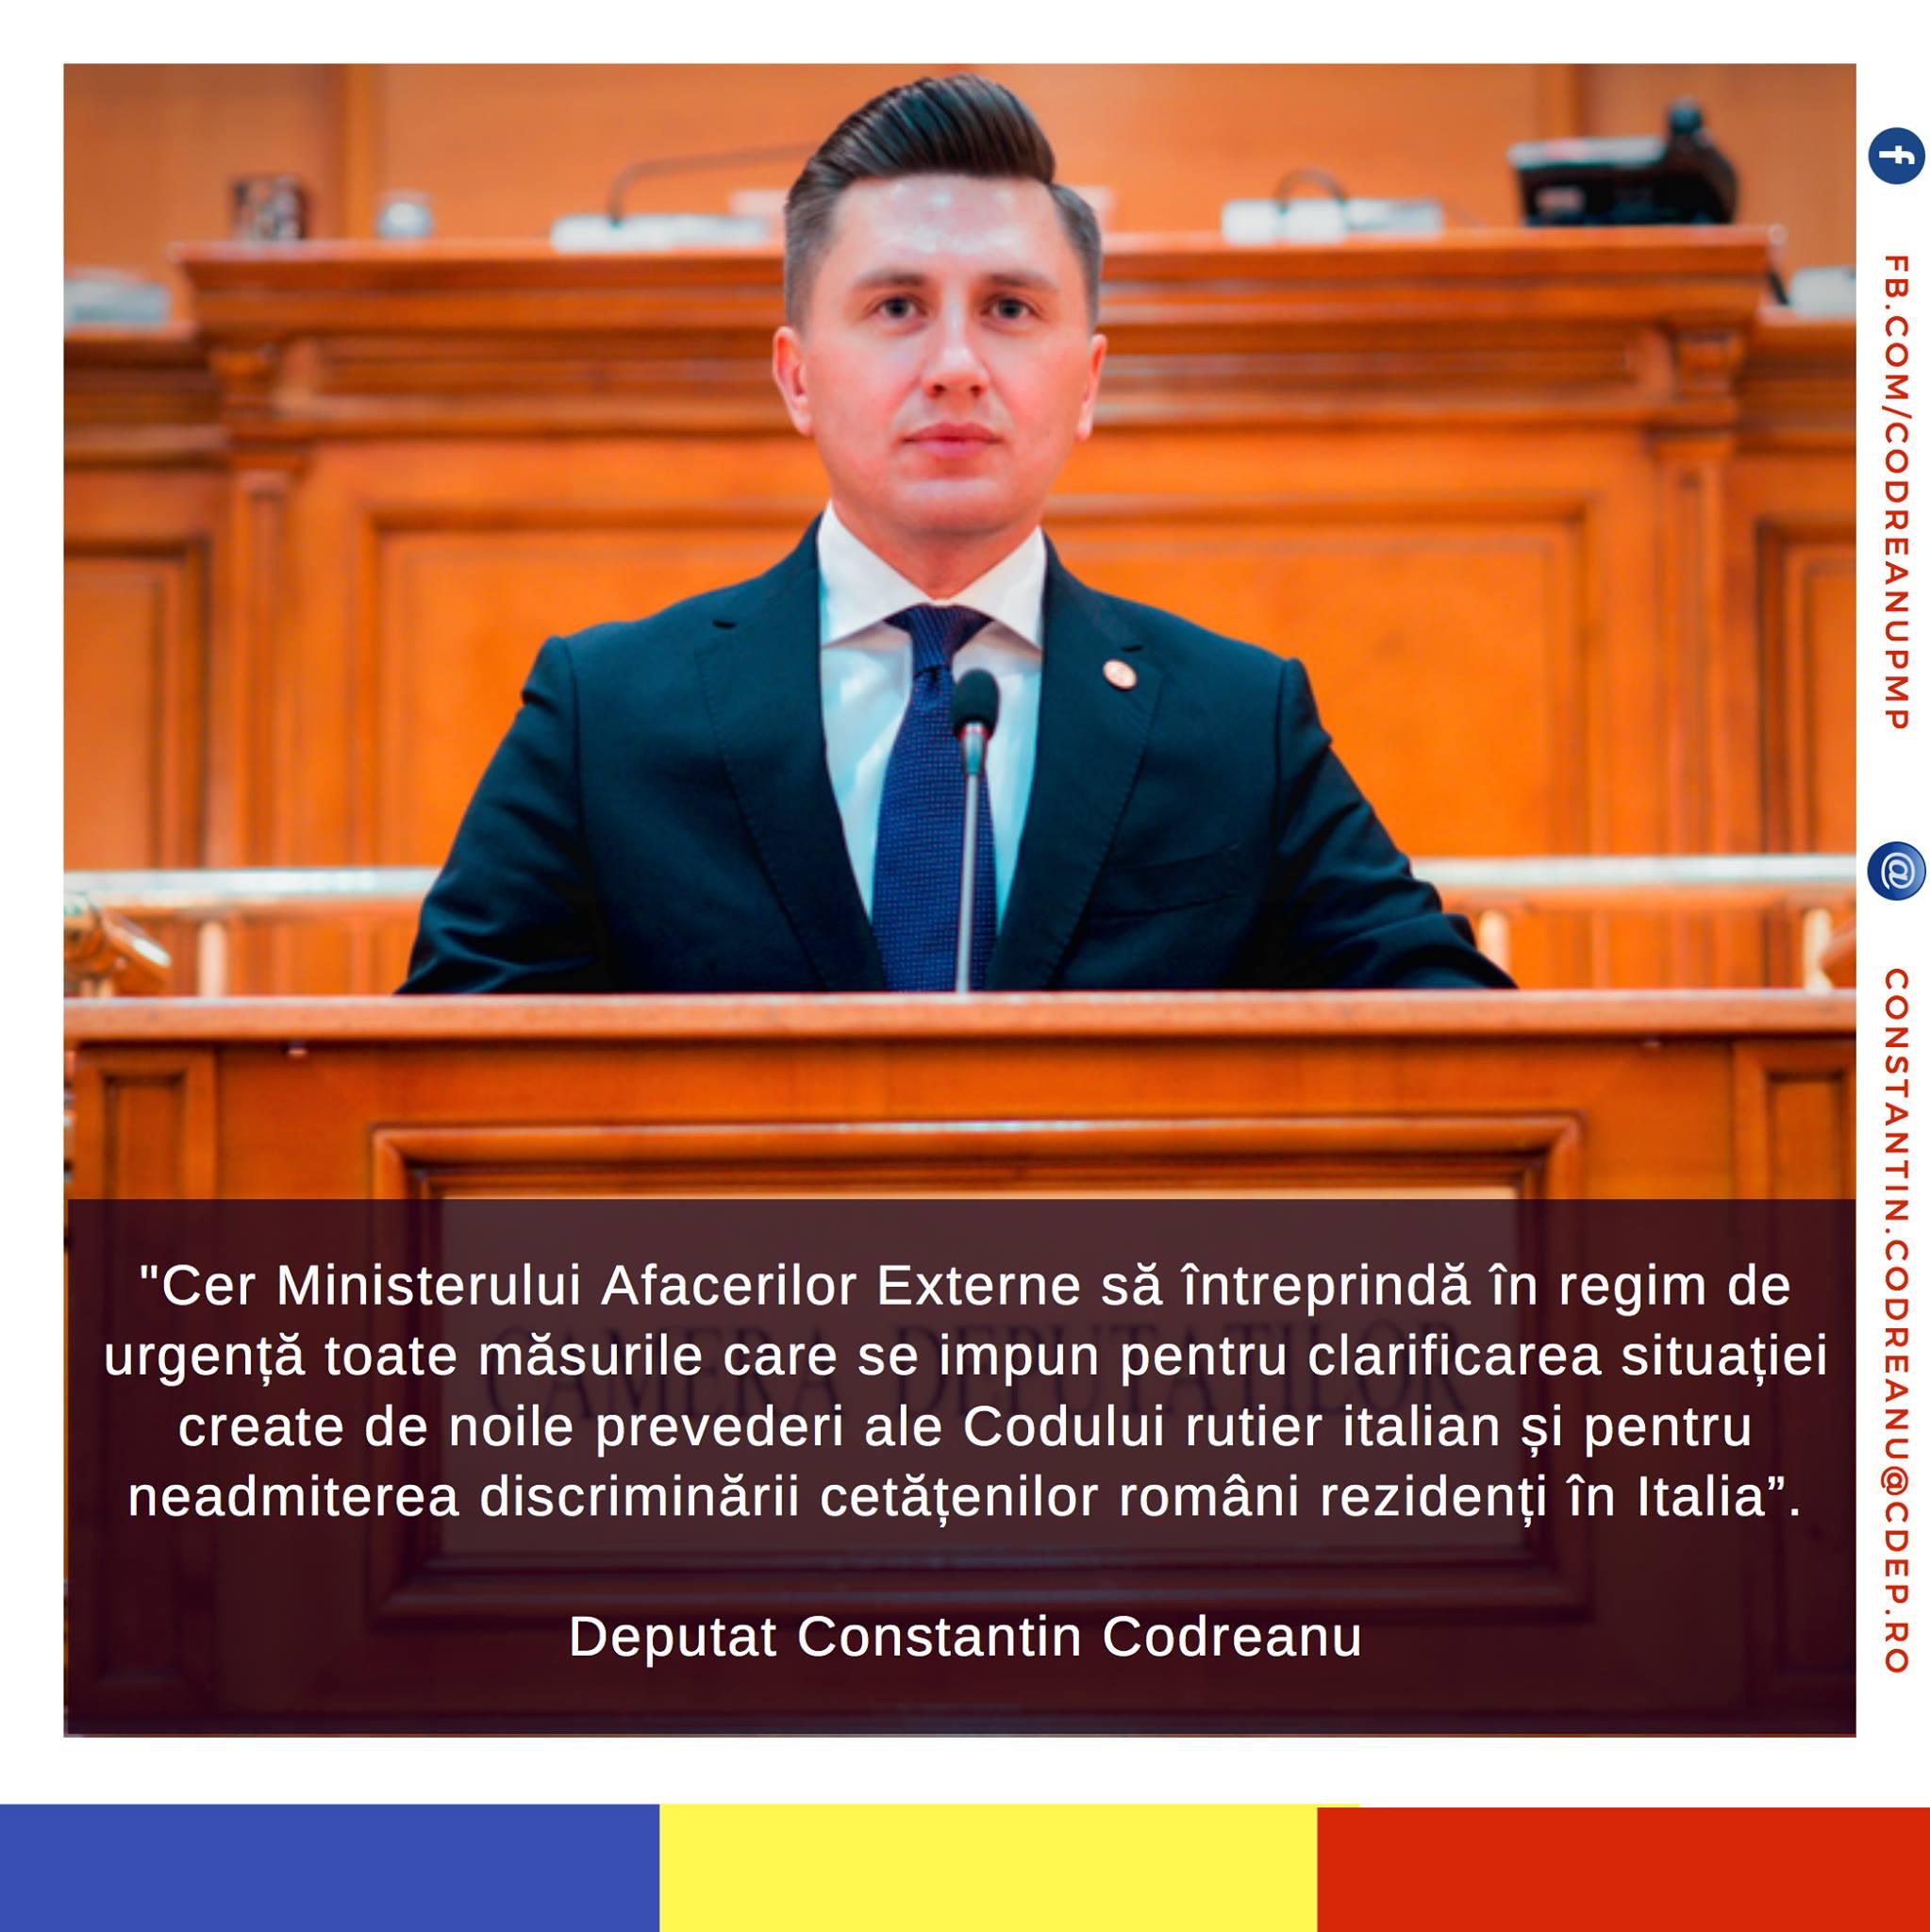 Constantin Codreanu Codul Rutier Italian